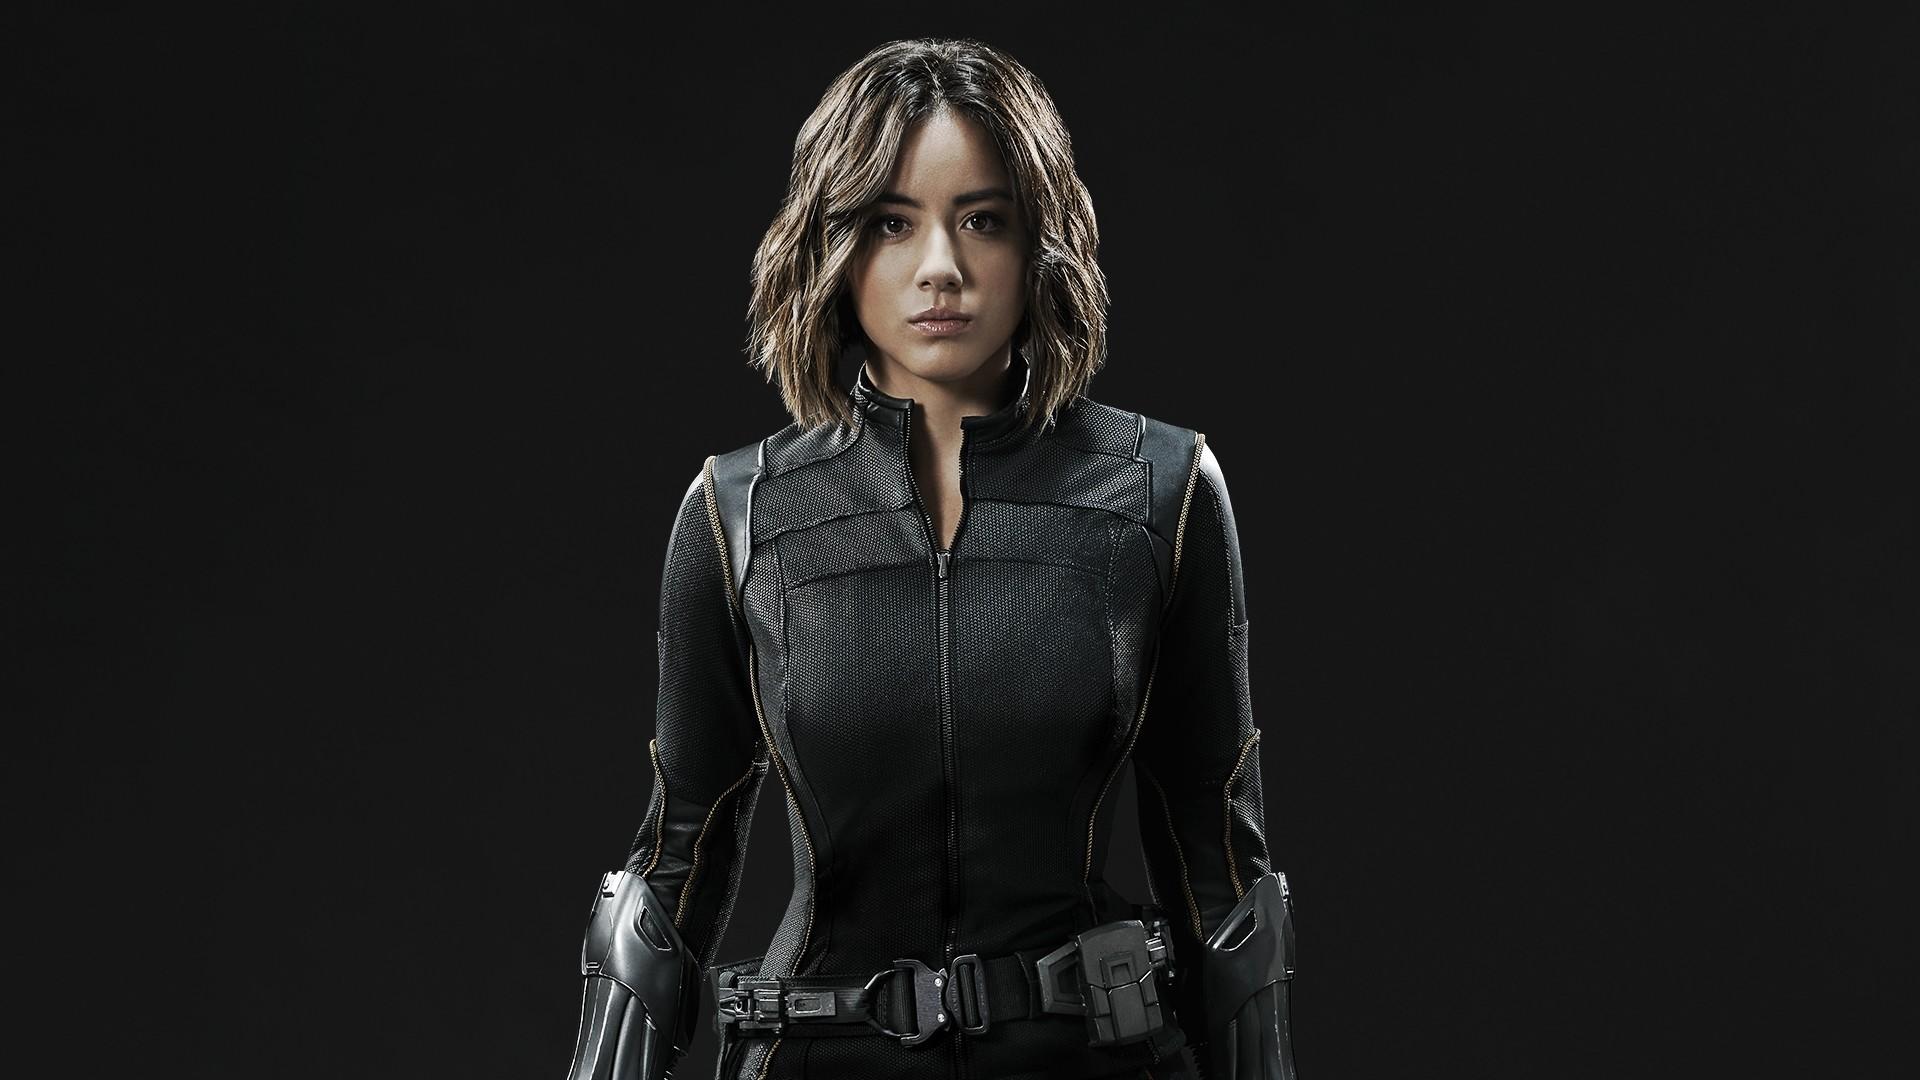 TV Show – Marvel's Agents of S.H.I.E.L.D. Daisy (Agents of S.H.I.E.L.D.)  Chloe Bennet Wallpaper